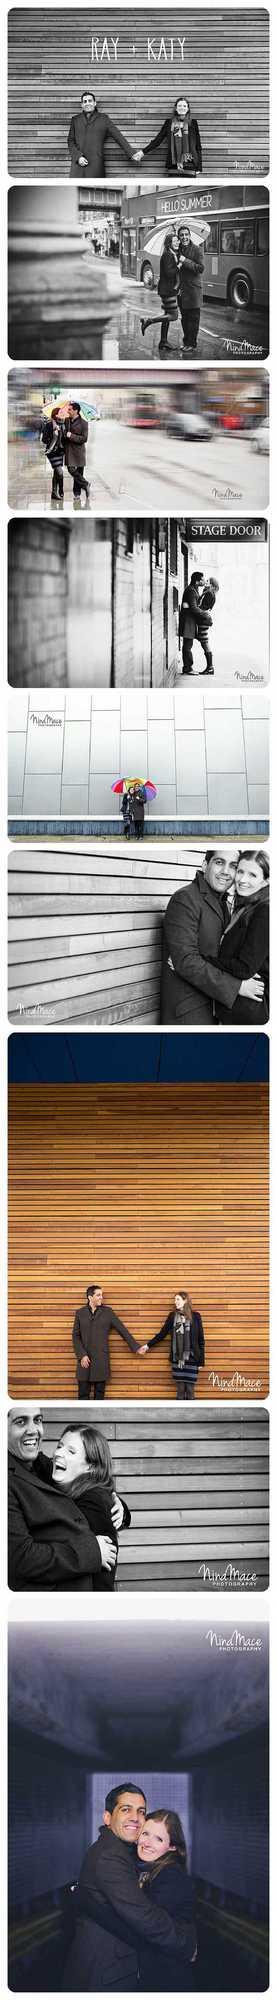 Engagement session in London moden fun photos taken by Nina Mace in Shepherds Bush